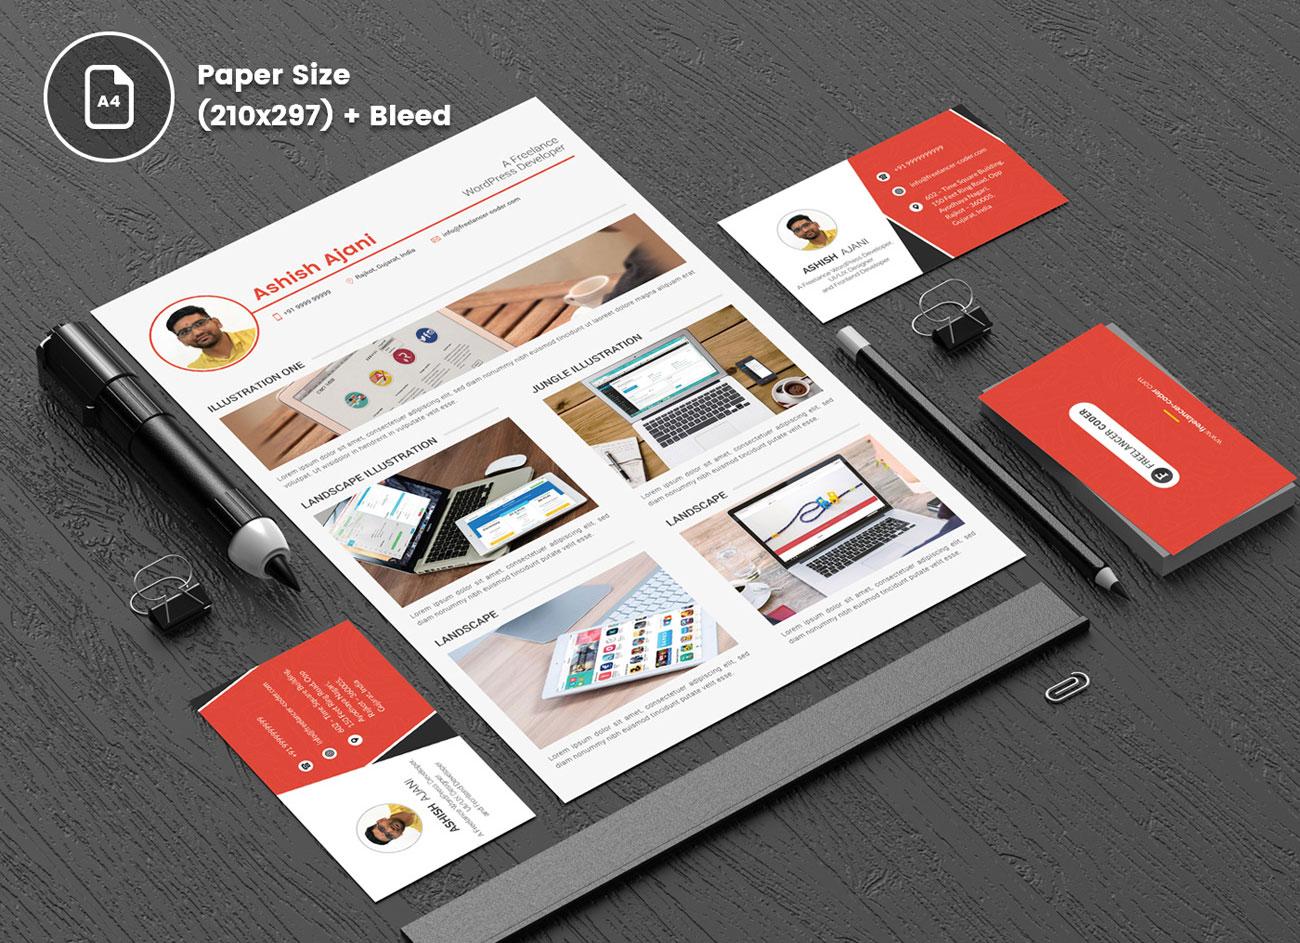 Free-PSD-Resume-Template-&-Cover-Letter-for-PHP-&-Wordpress-Developer-6